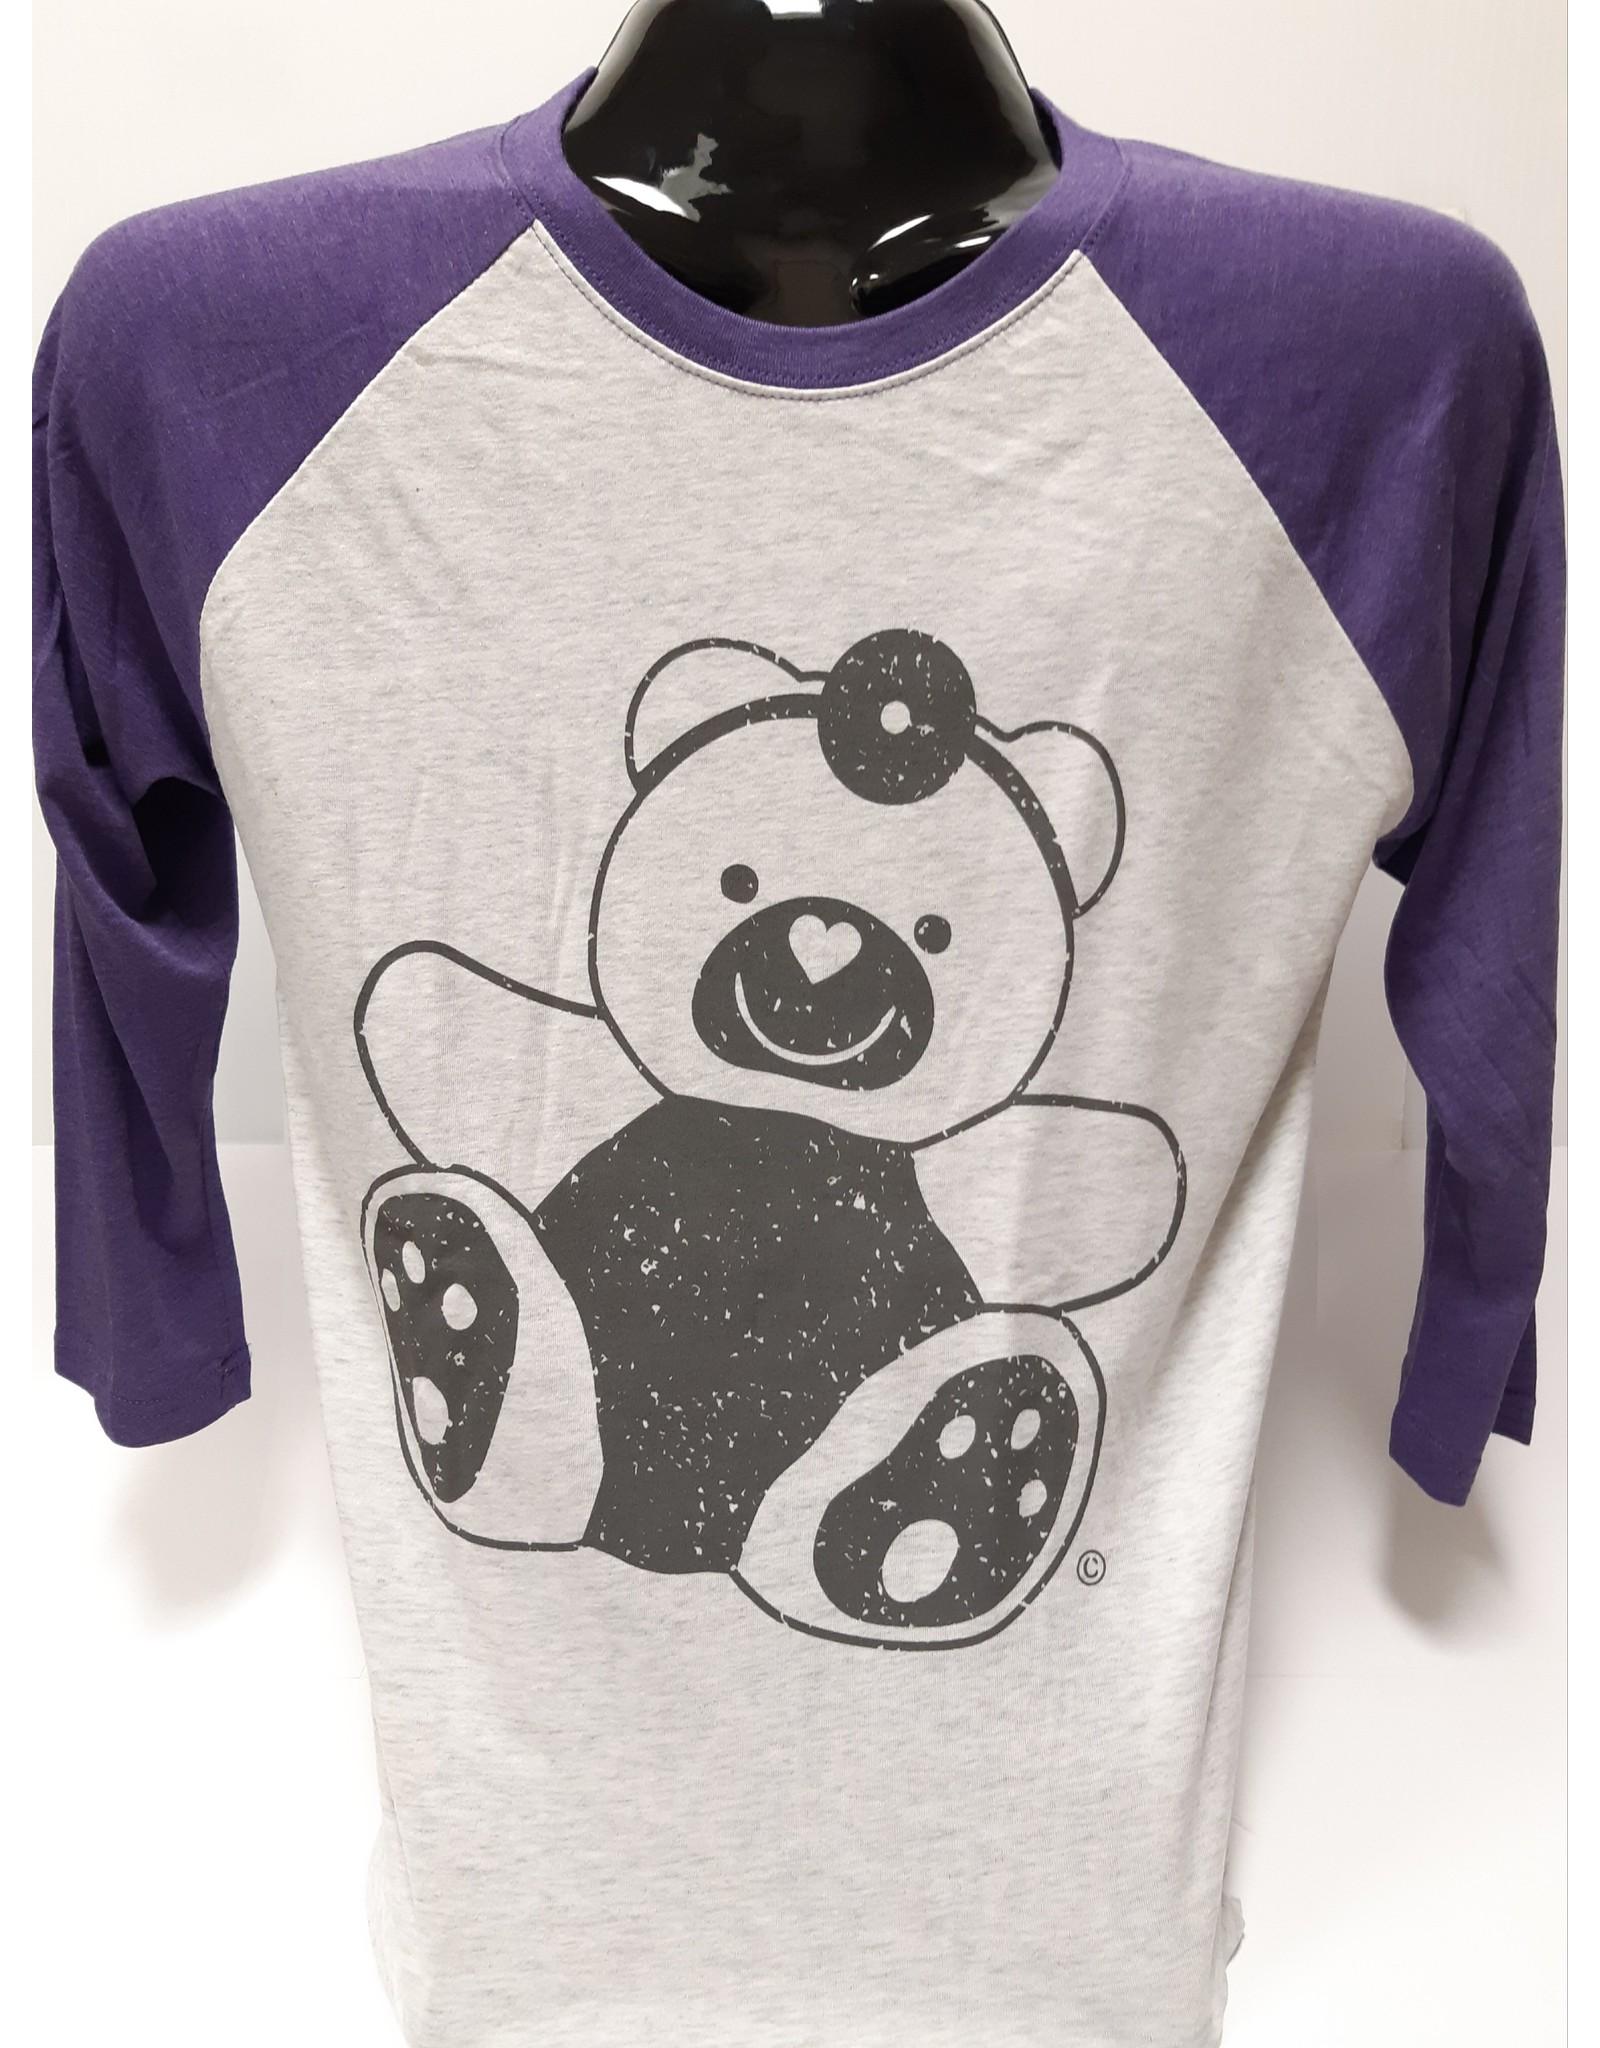 Stollery Adult 3/4 Sleeve Shirt